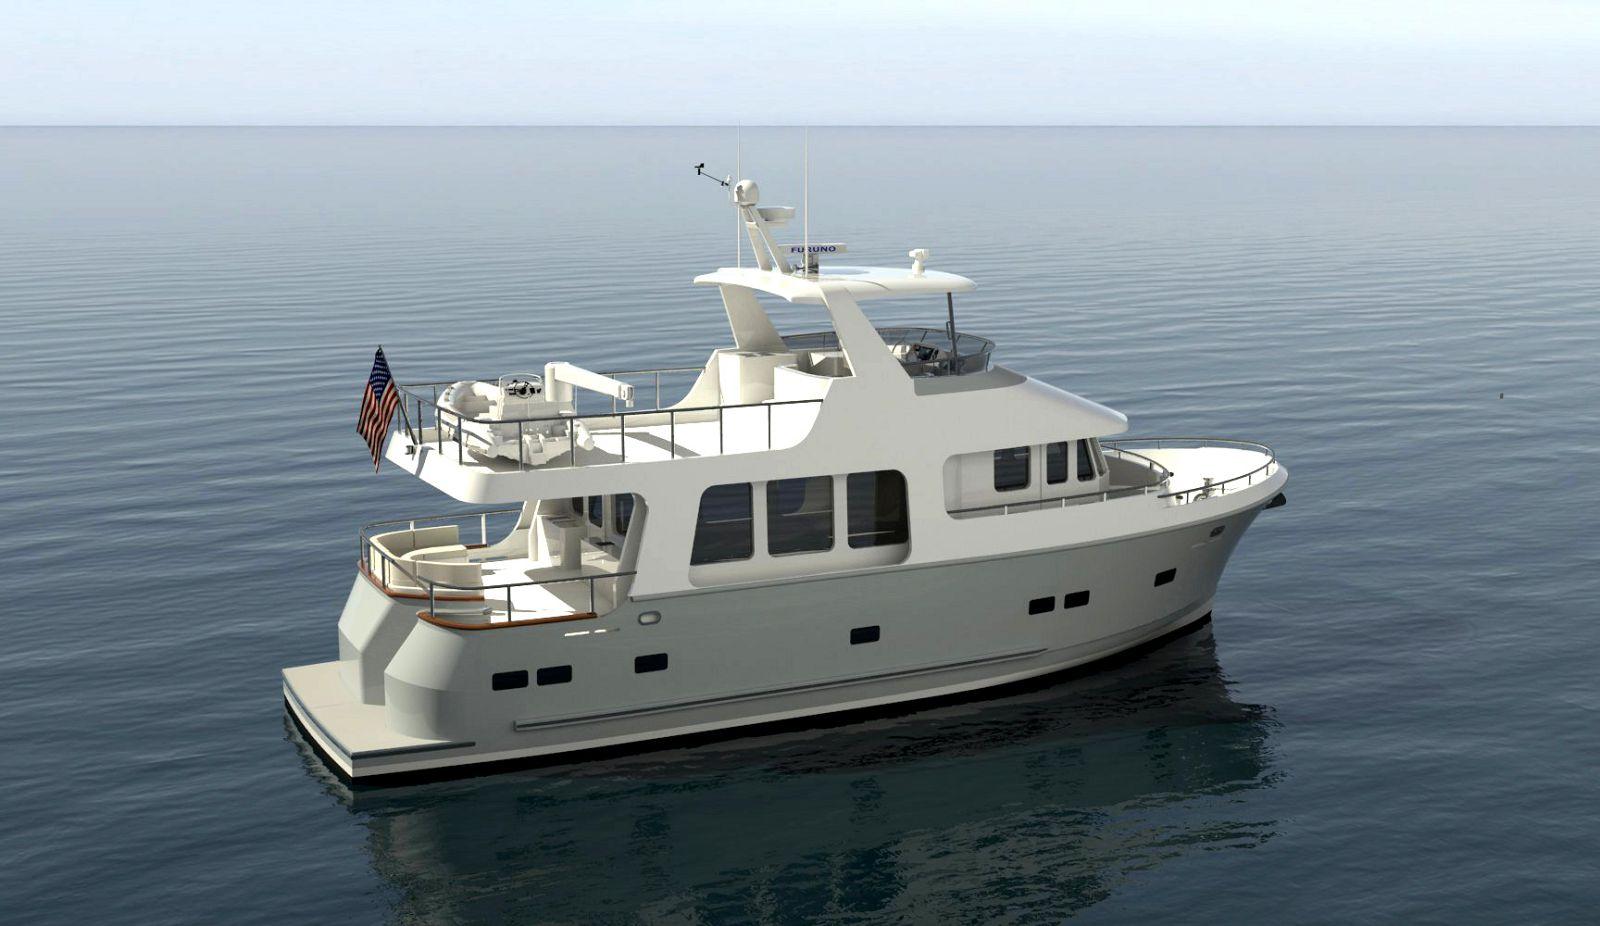 Alaskan-Yachts-57-MK-Rendering-2